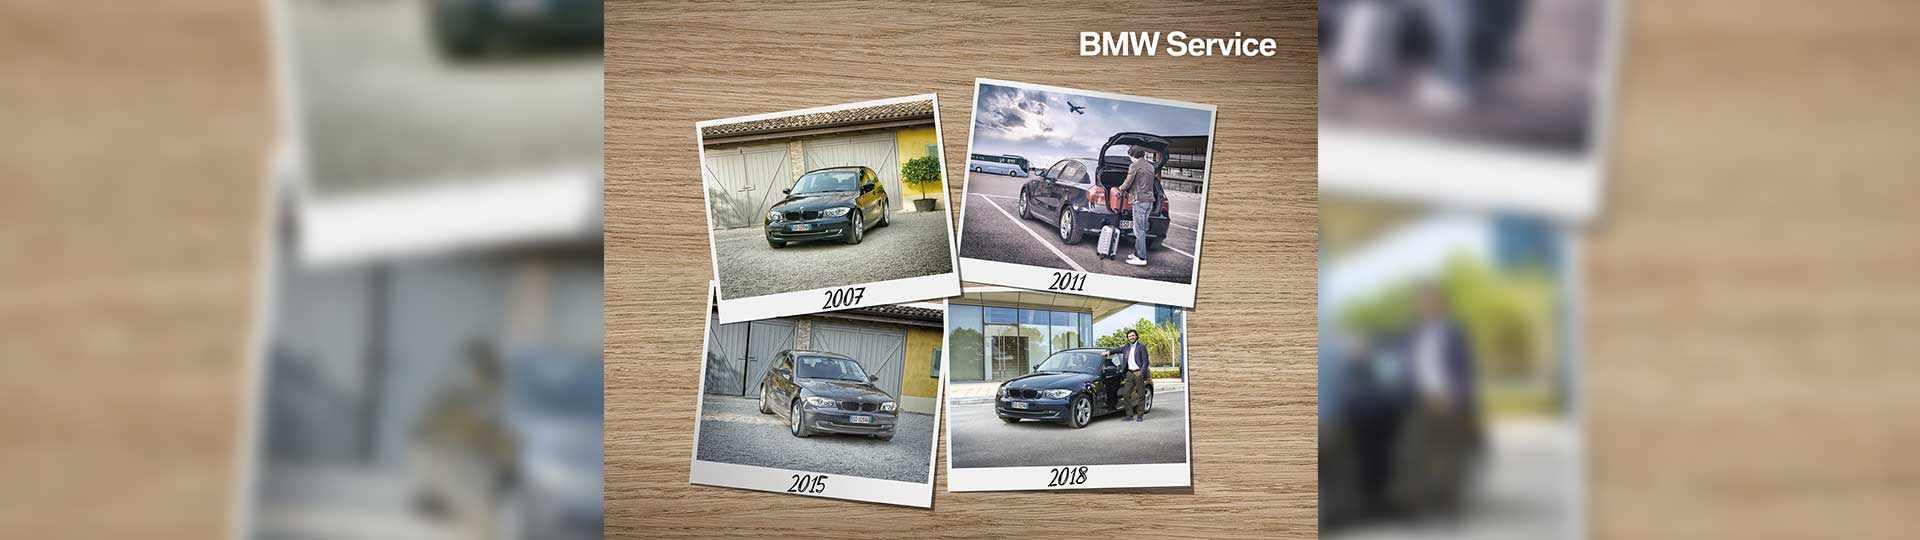 hd_servizio_valore_bmw.jpg